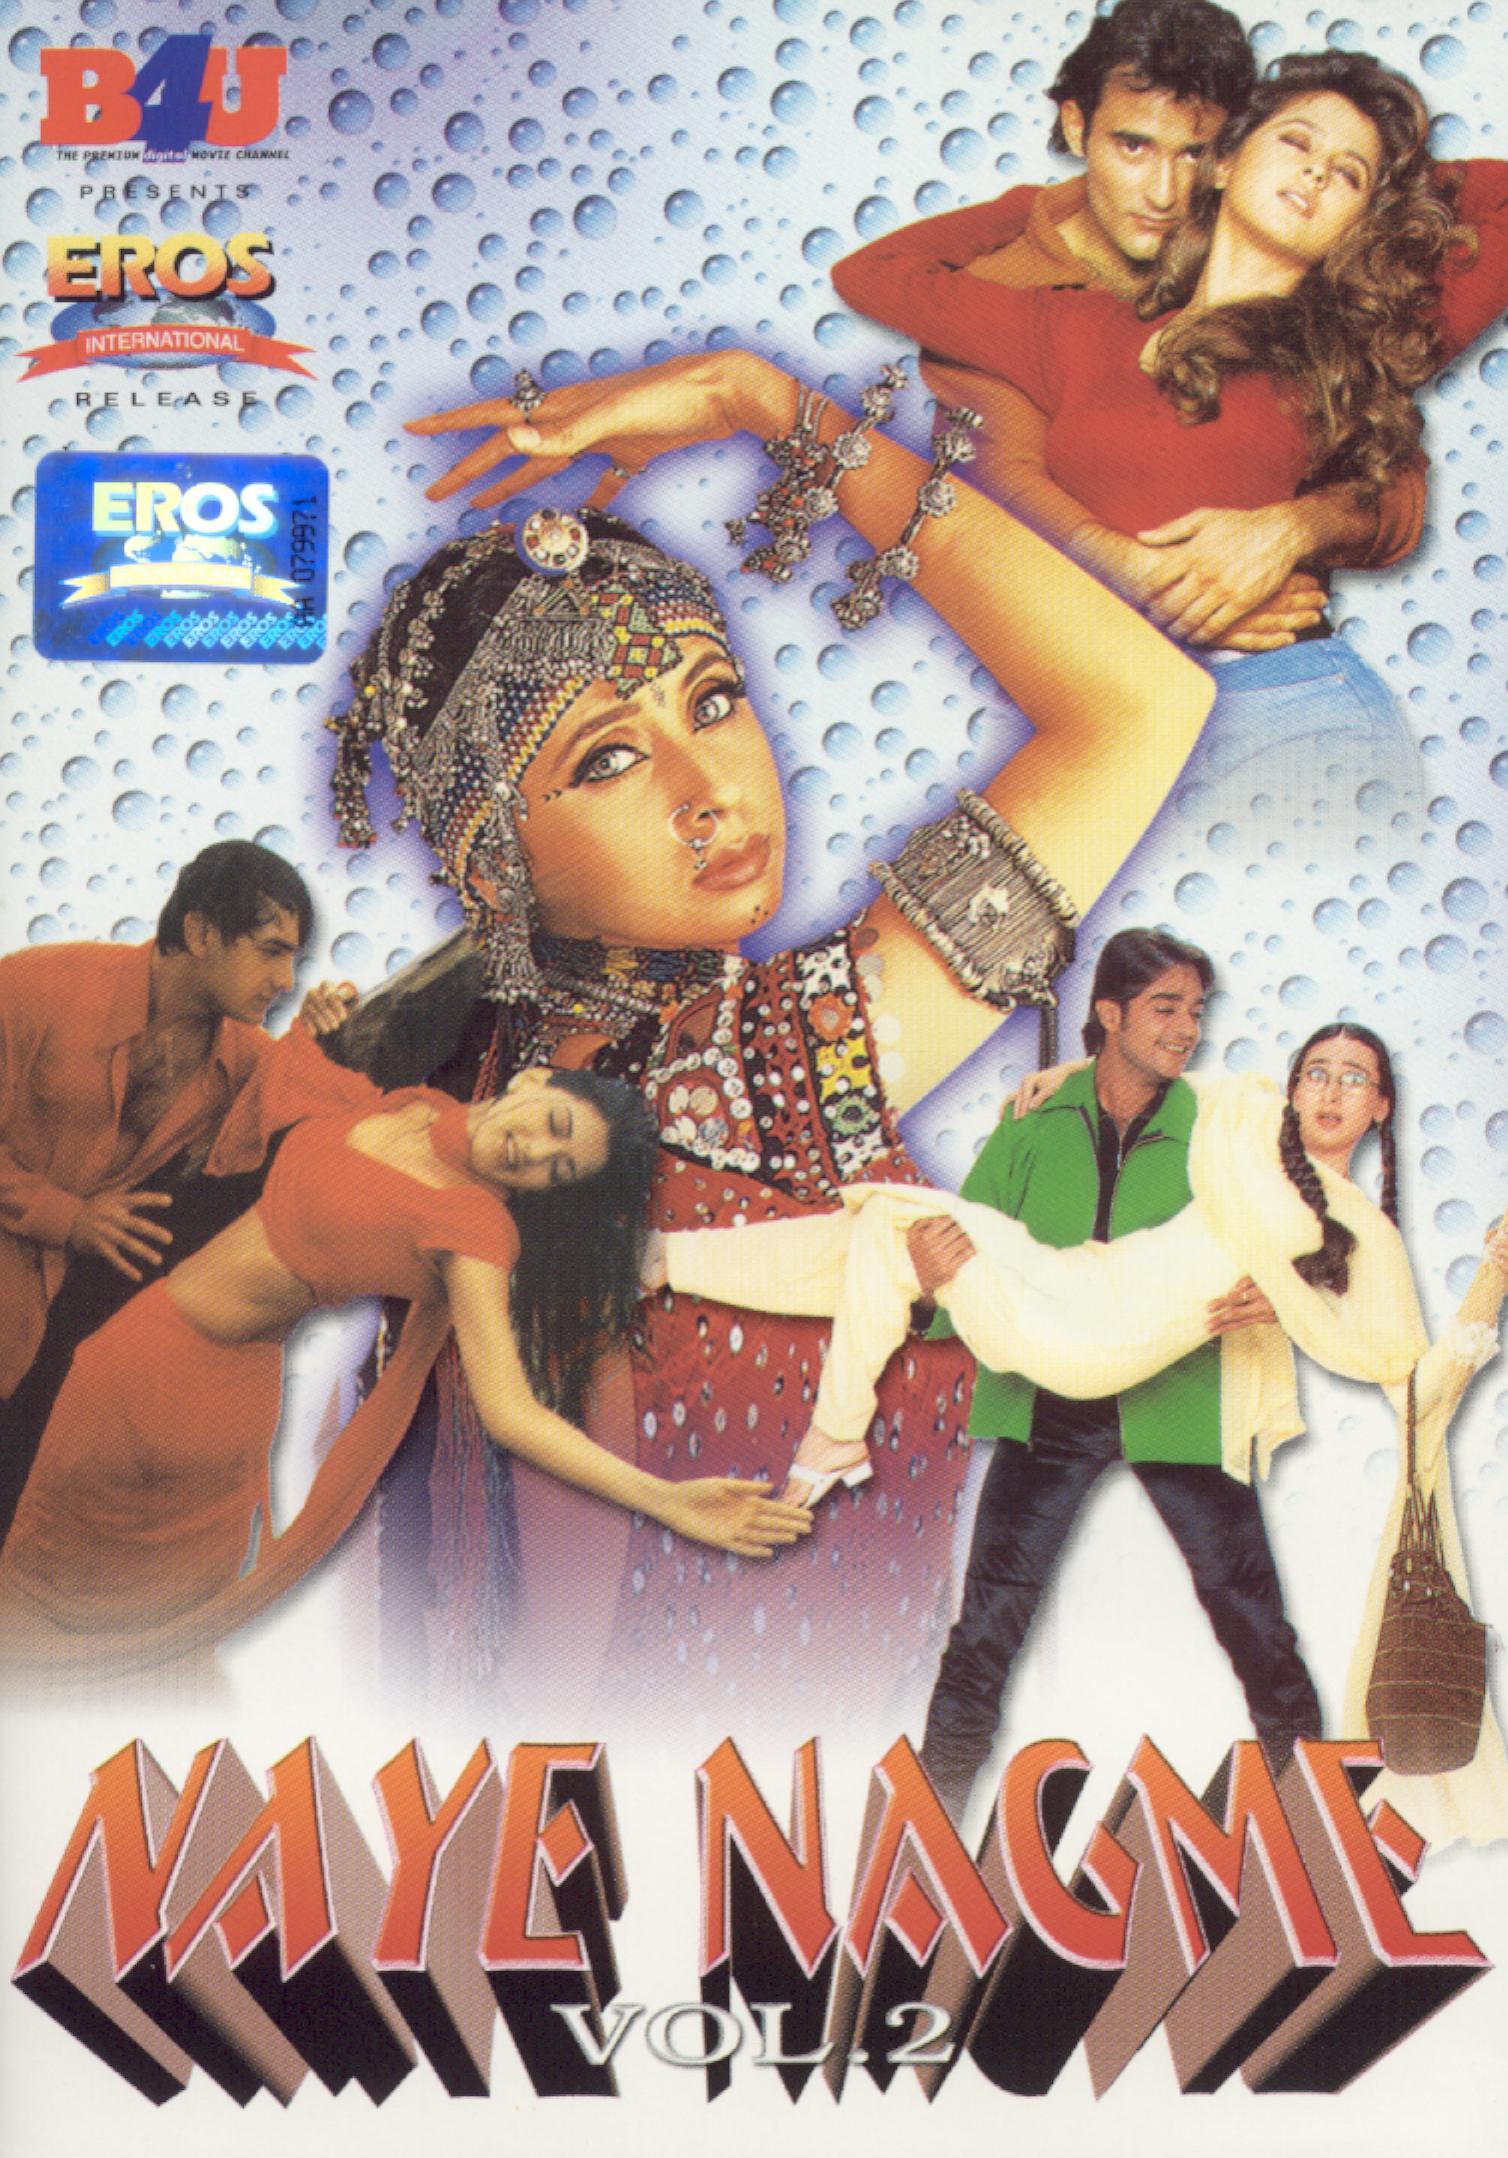 Naye Nagme, Vol. 2